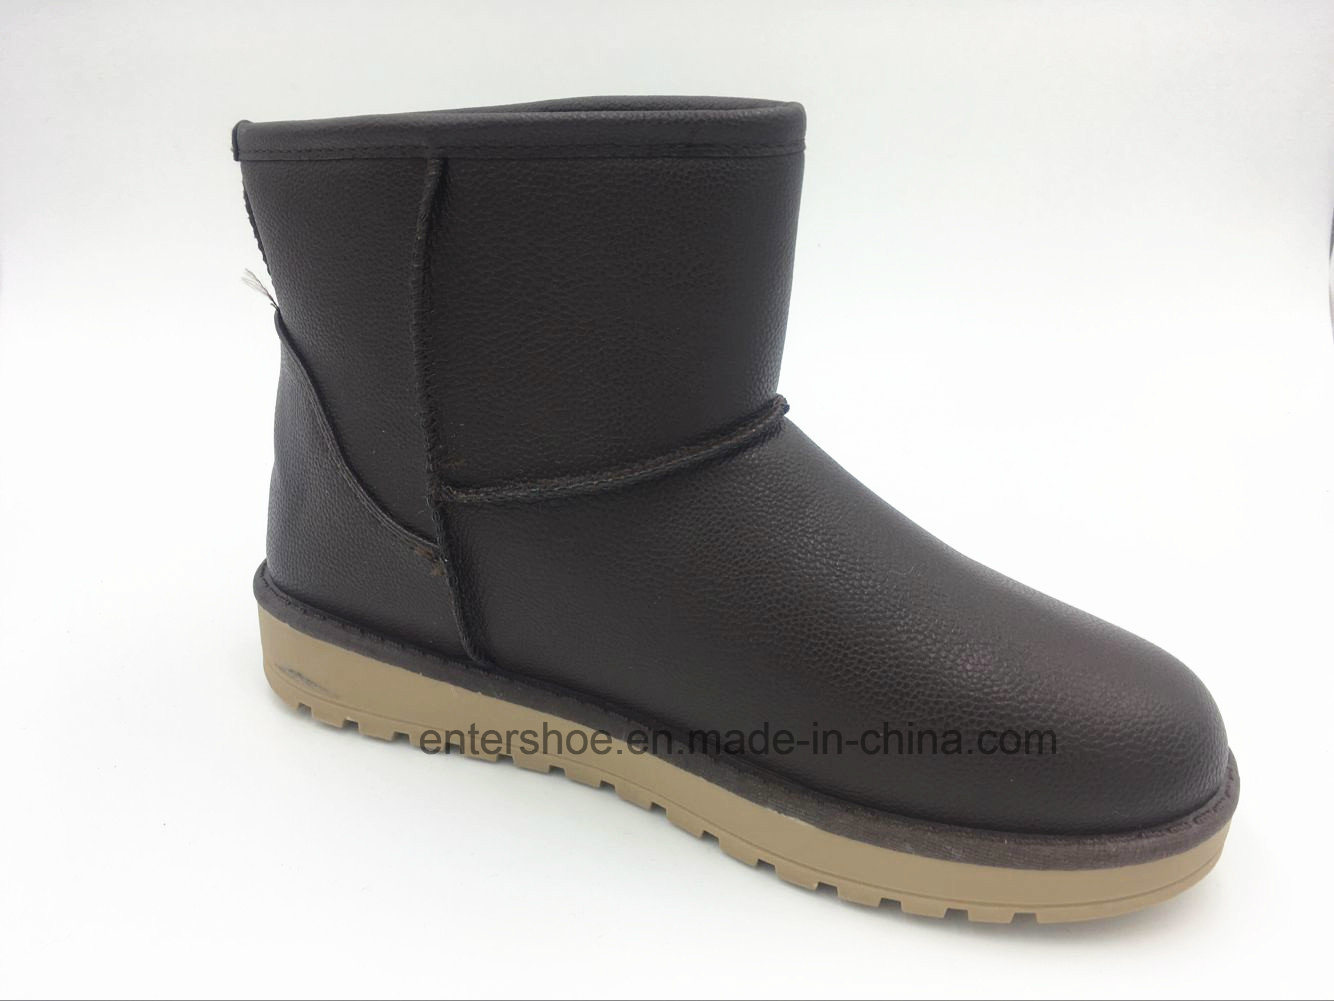 Winter Warm Women PU Snow Boots with PVC Outsole (ET-XK160238W)